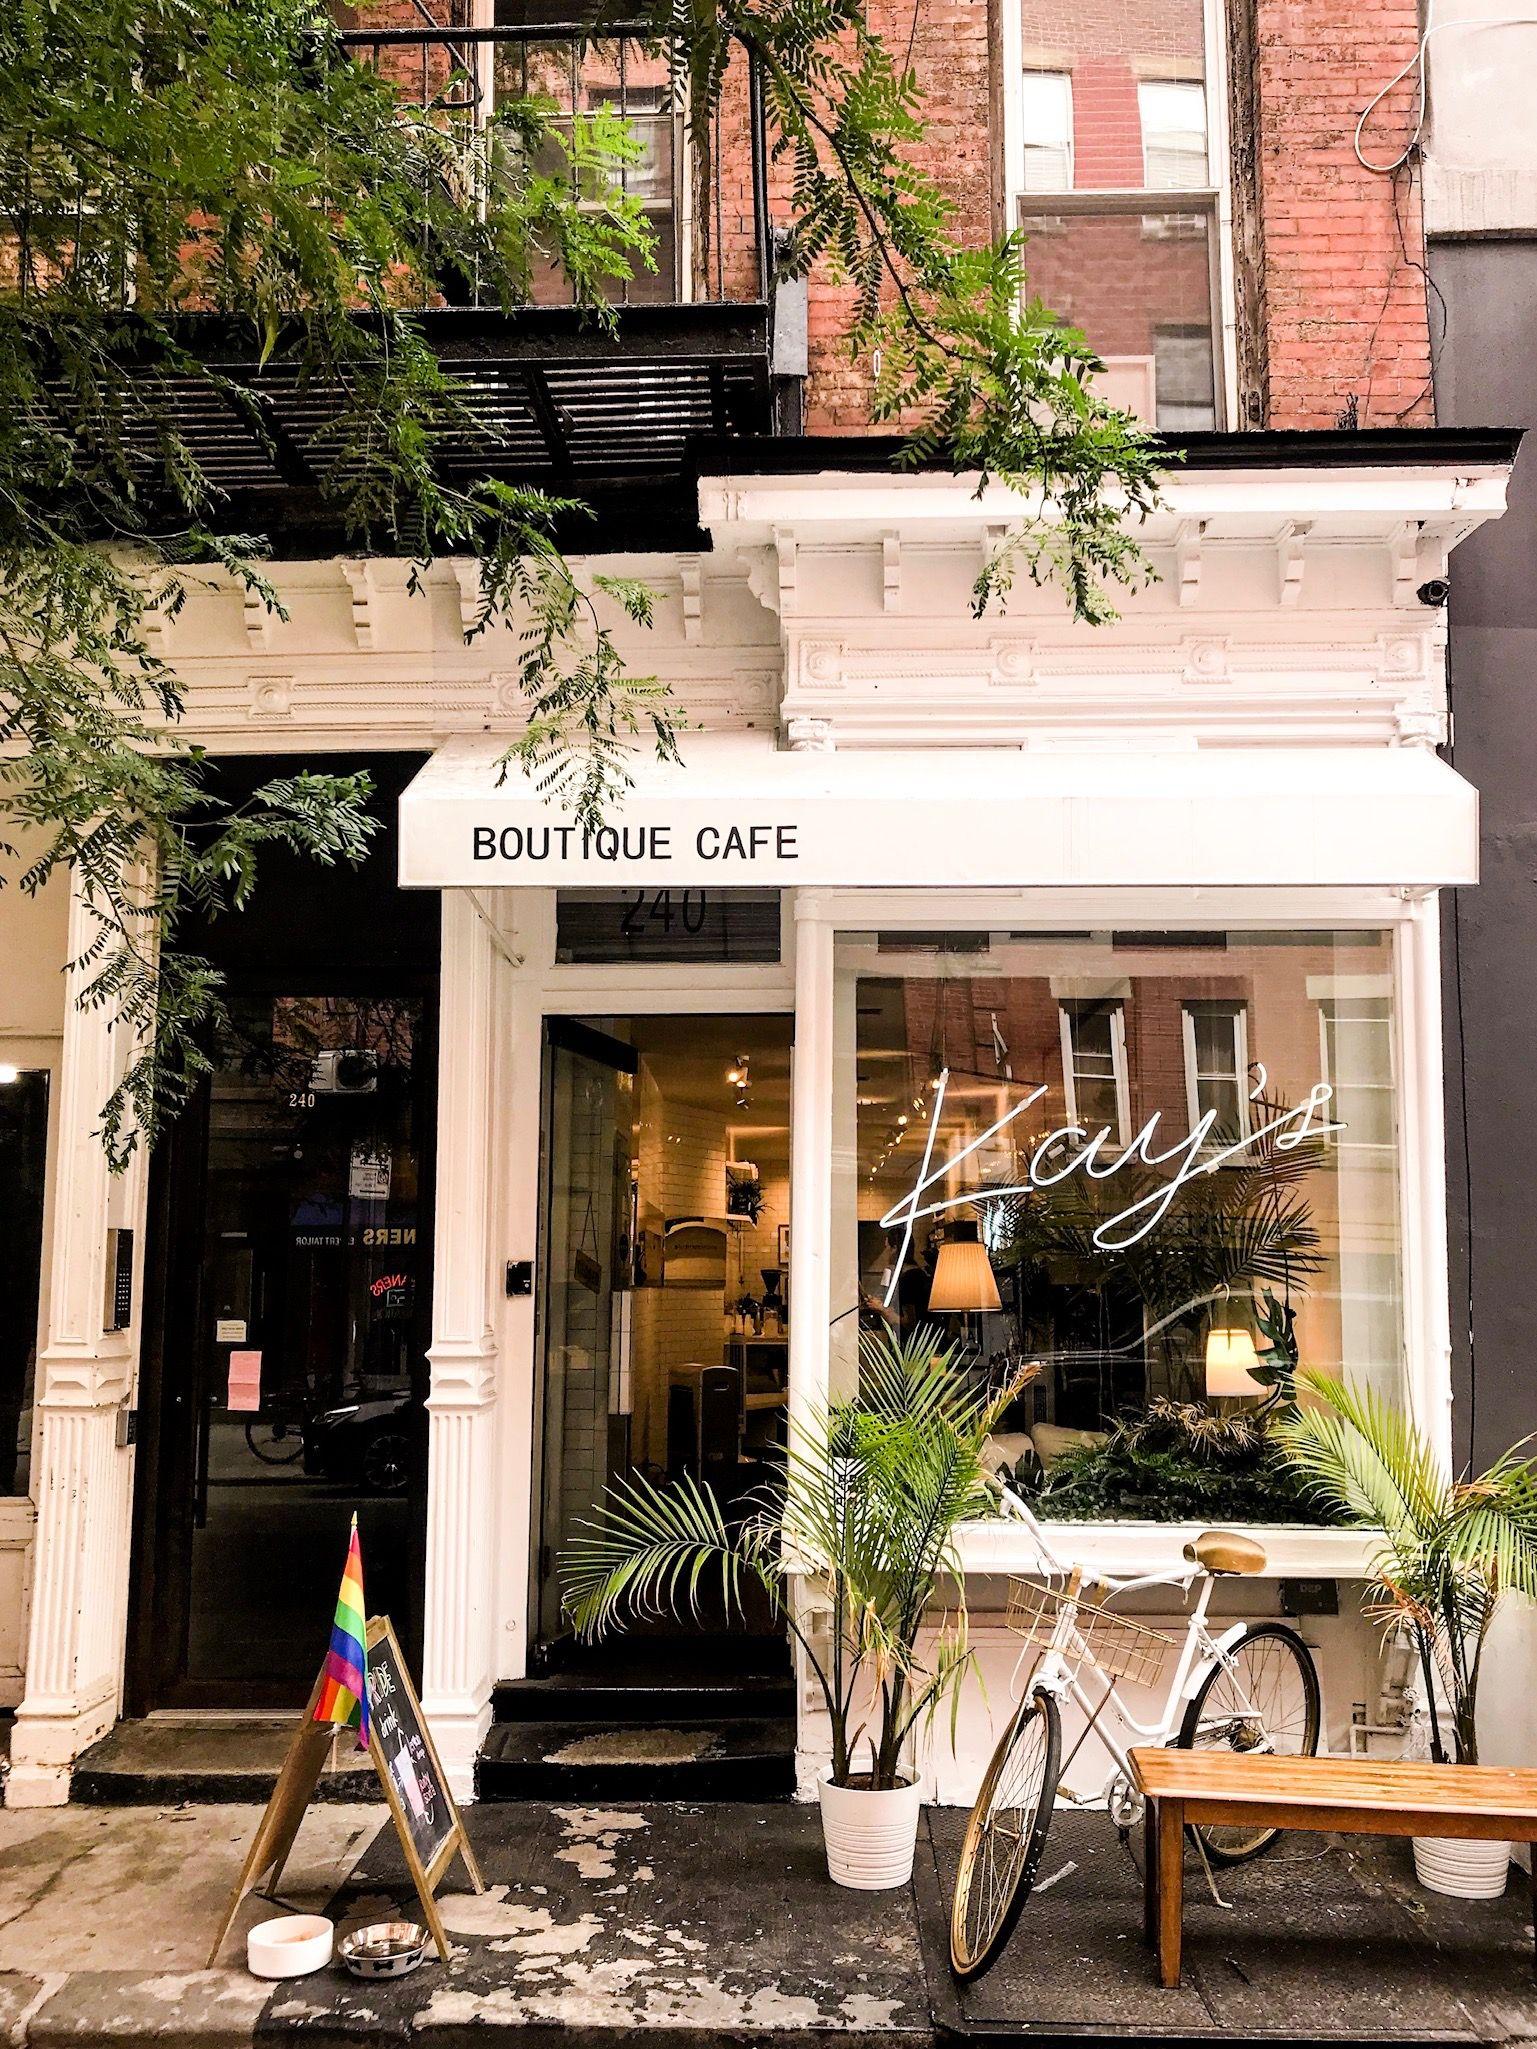 newyork usa pride flag shopfronts ritafarhifinds